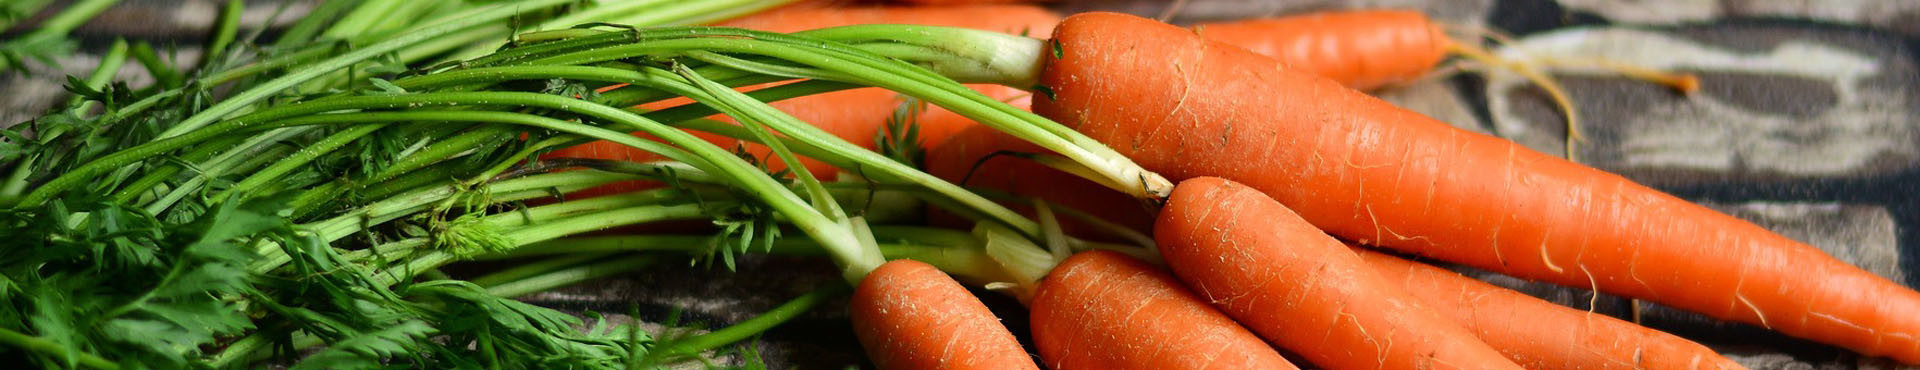 Semi di carota